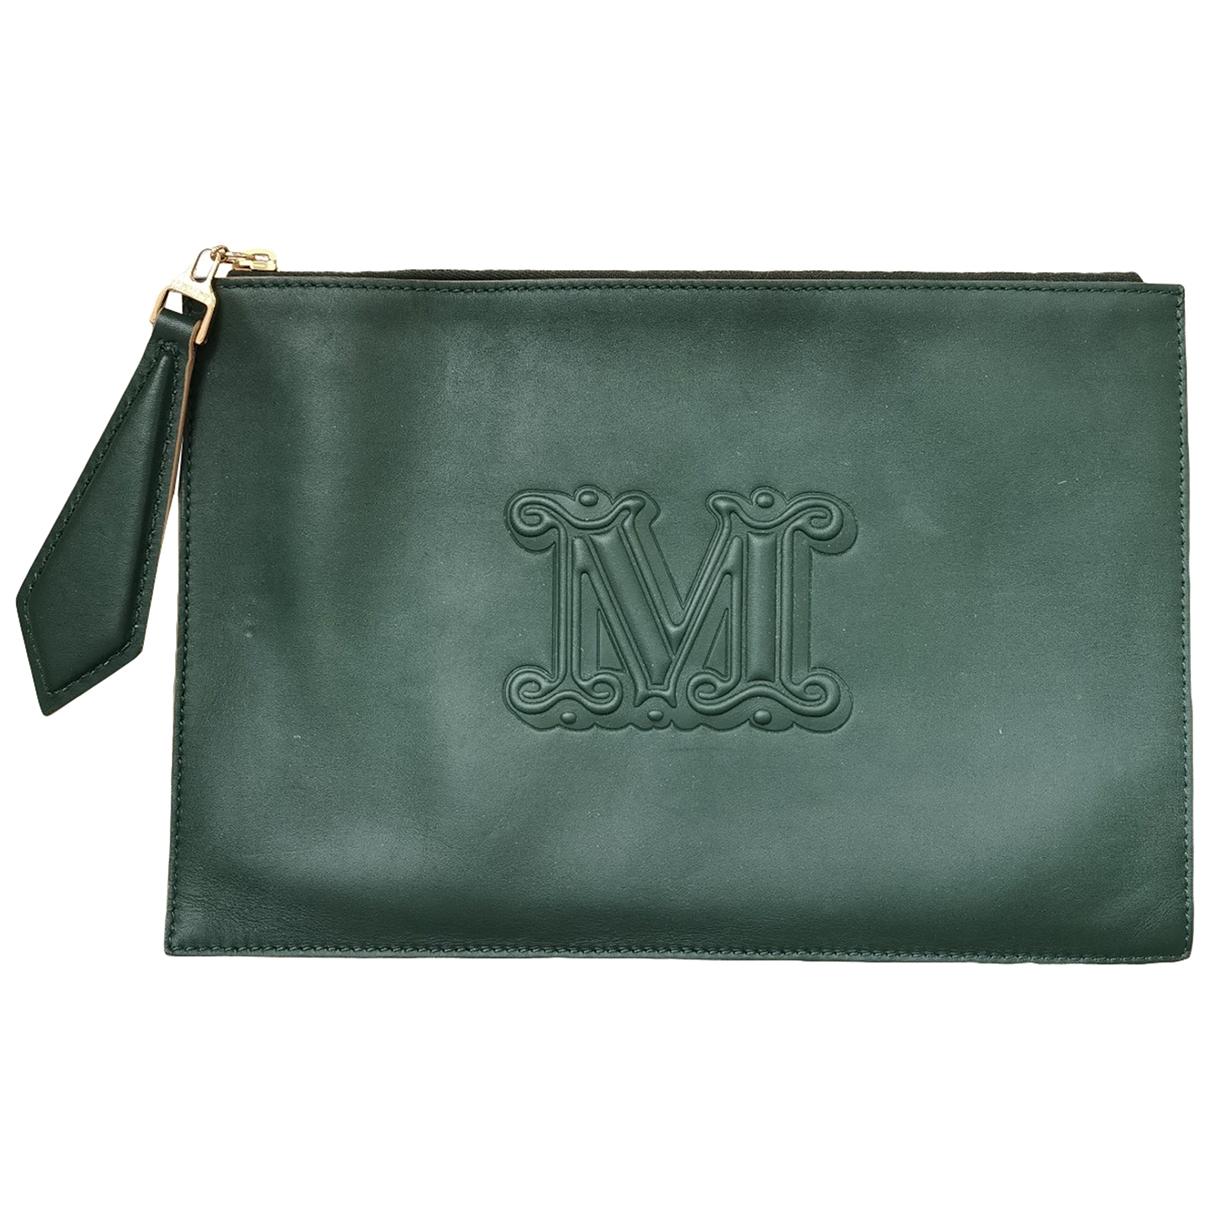 Max Mara - Pochette   pour femme en cuir - vert